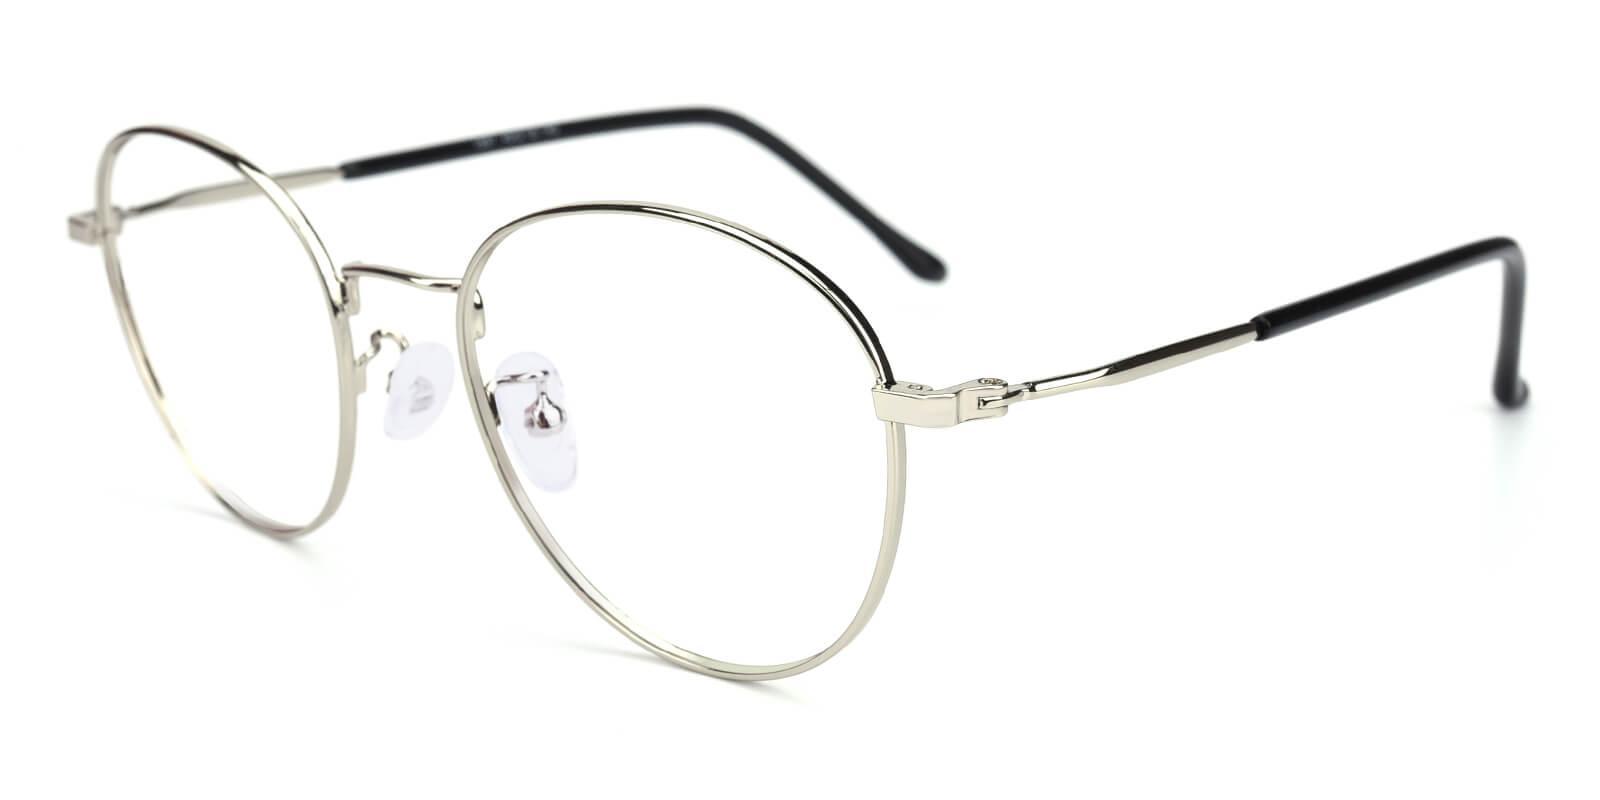 Devi-Silver-Oval-Metal-Eyeglasses-additional1